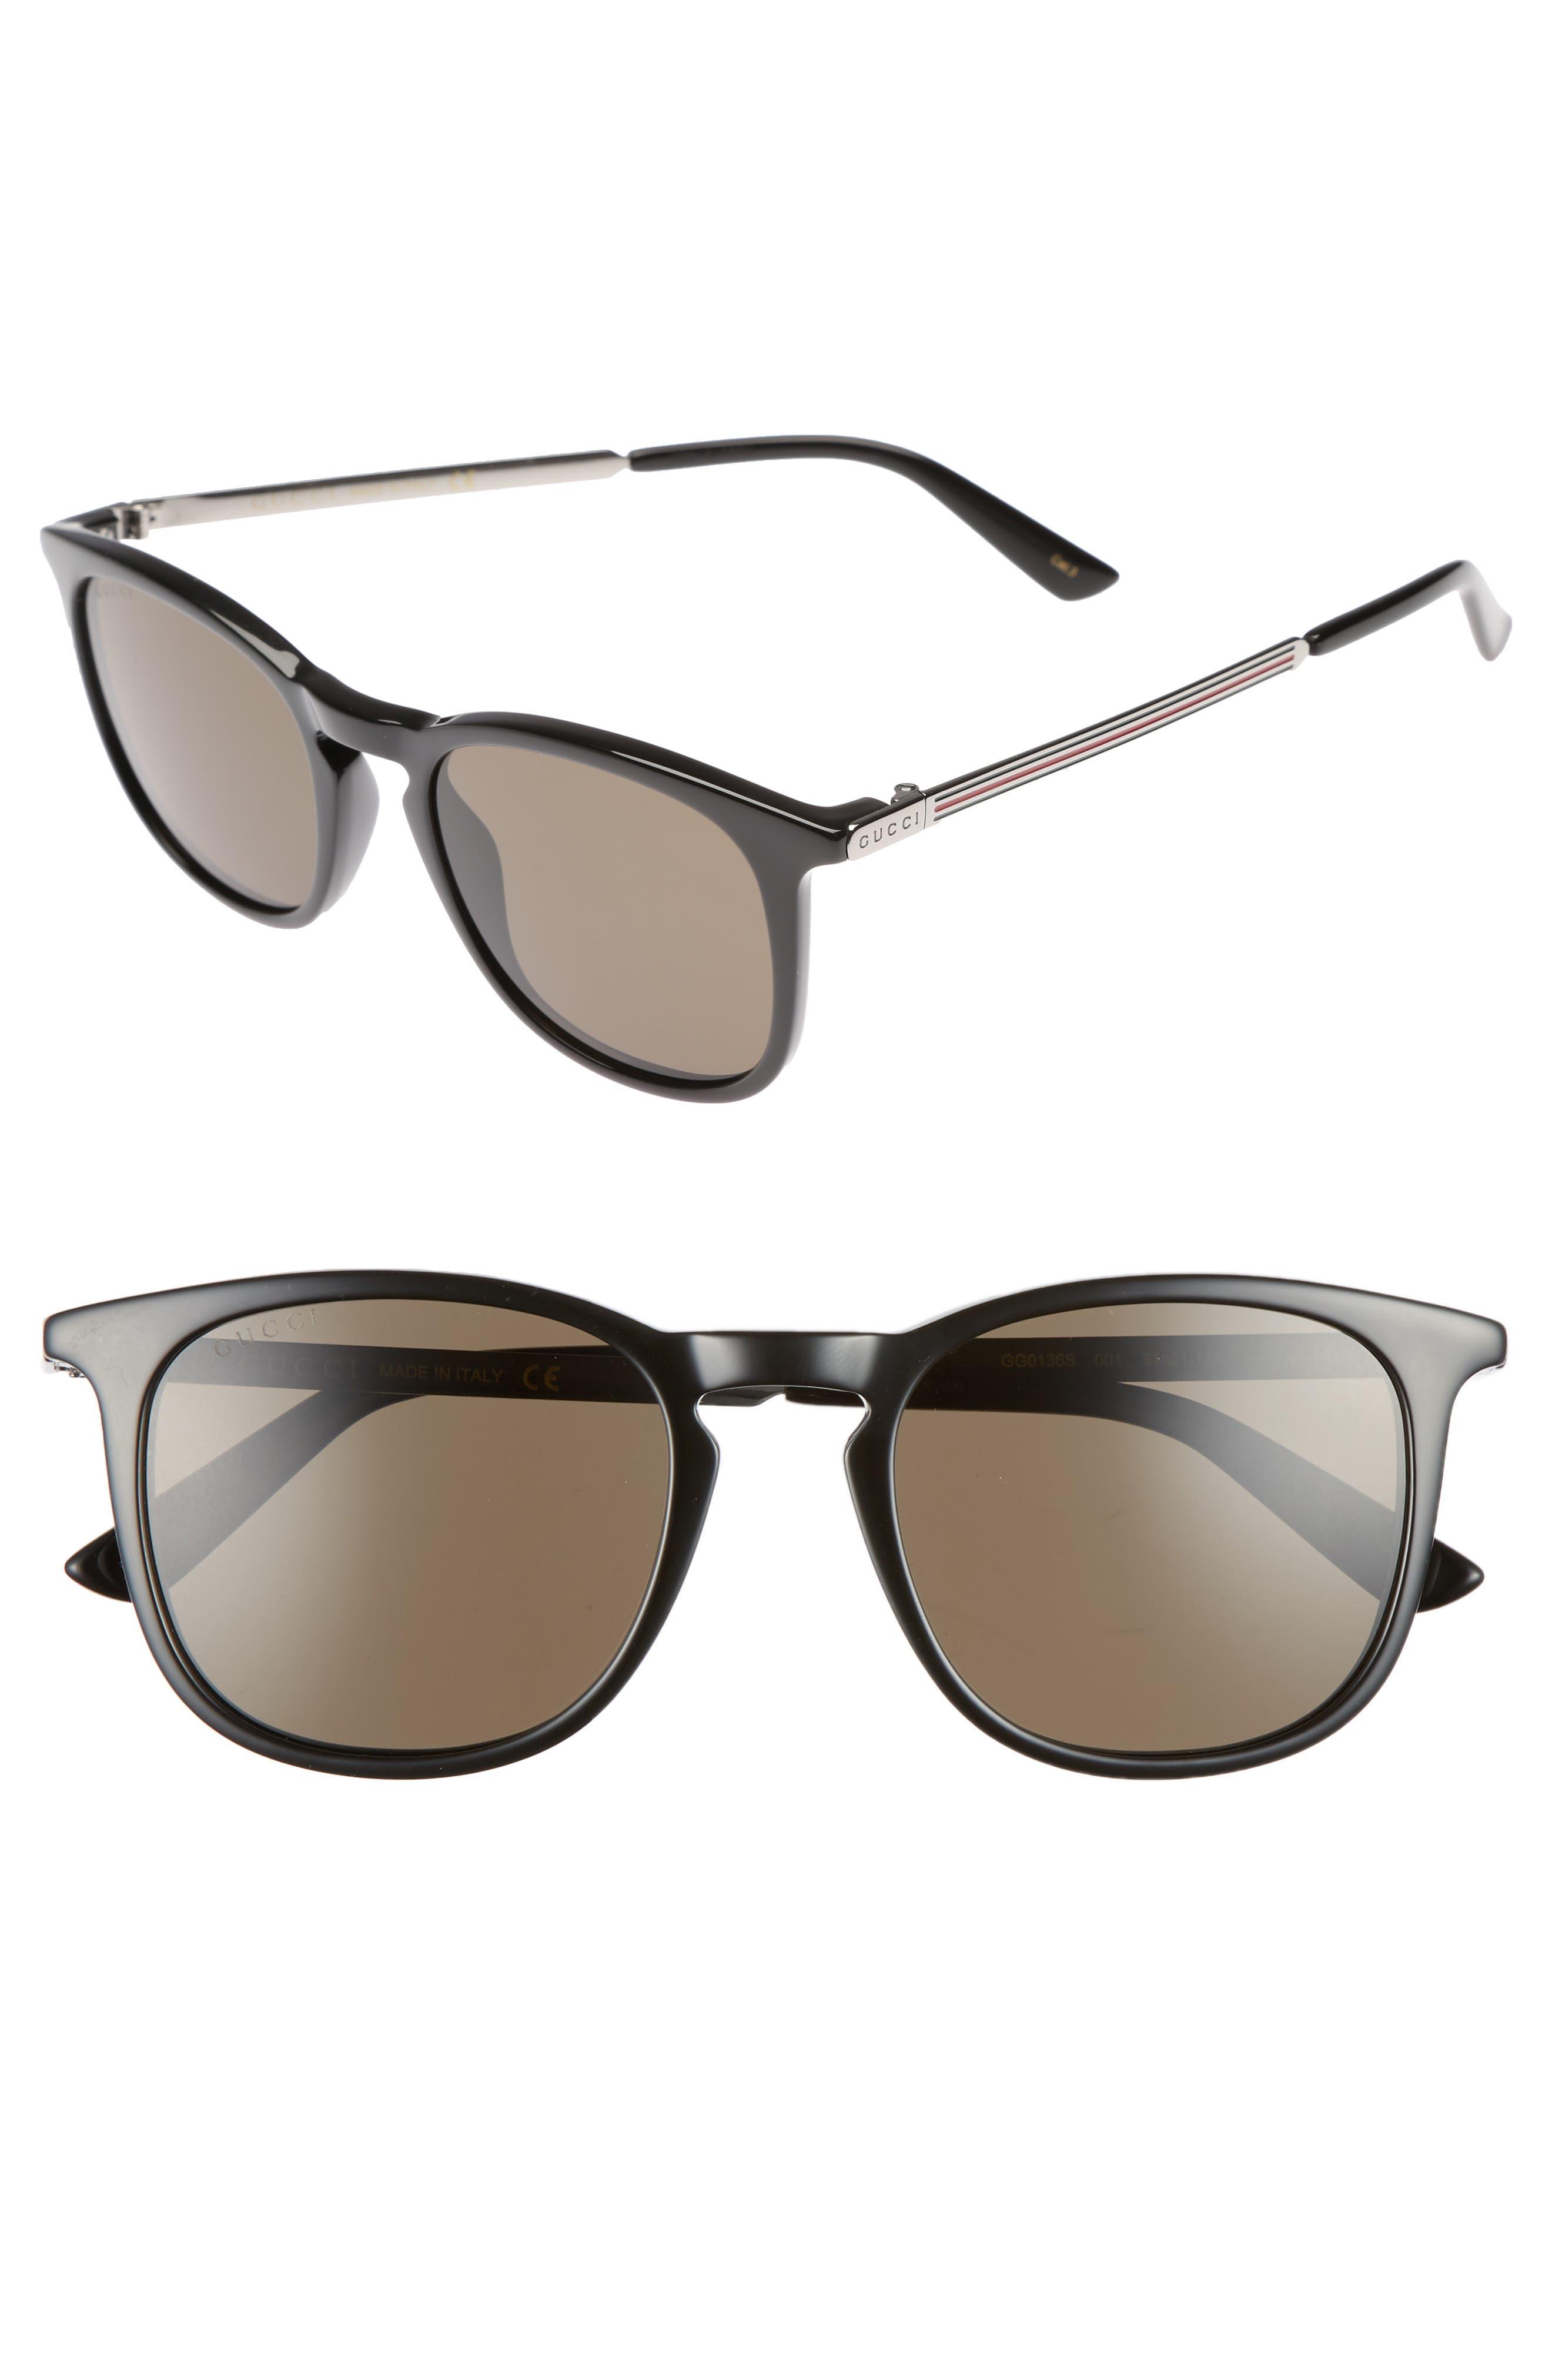 Optyl 51mm Sunglasses,                         Main,                         color, 001